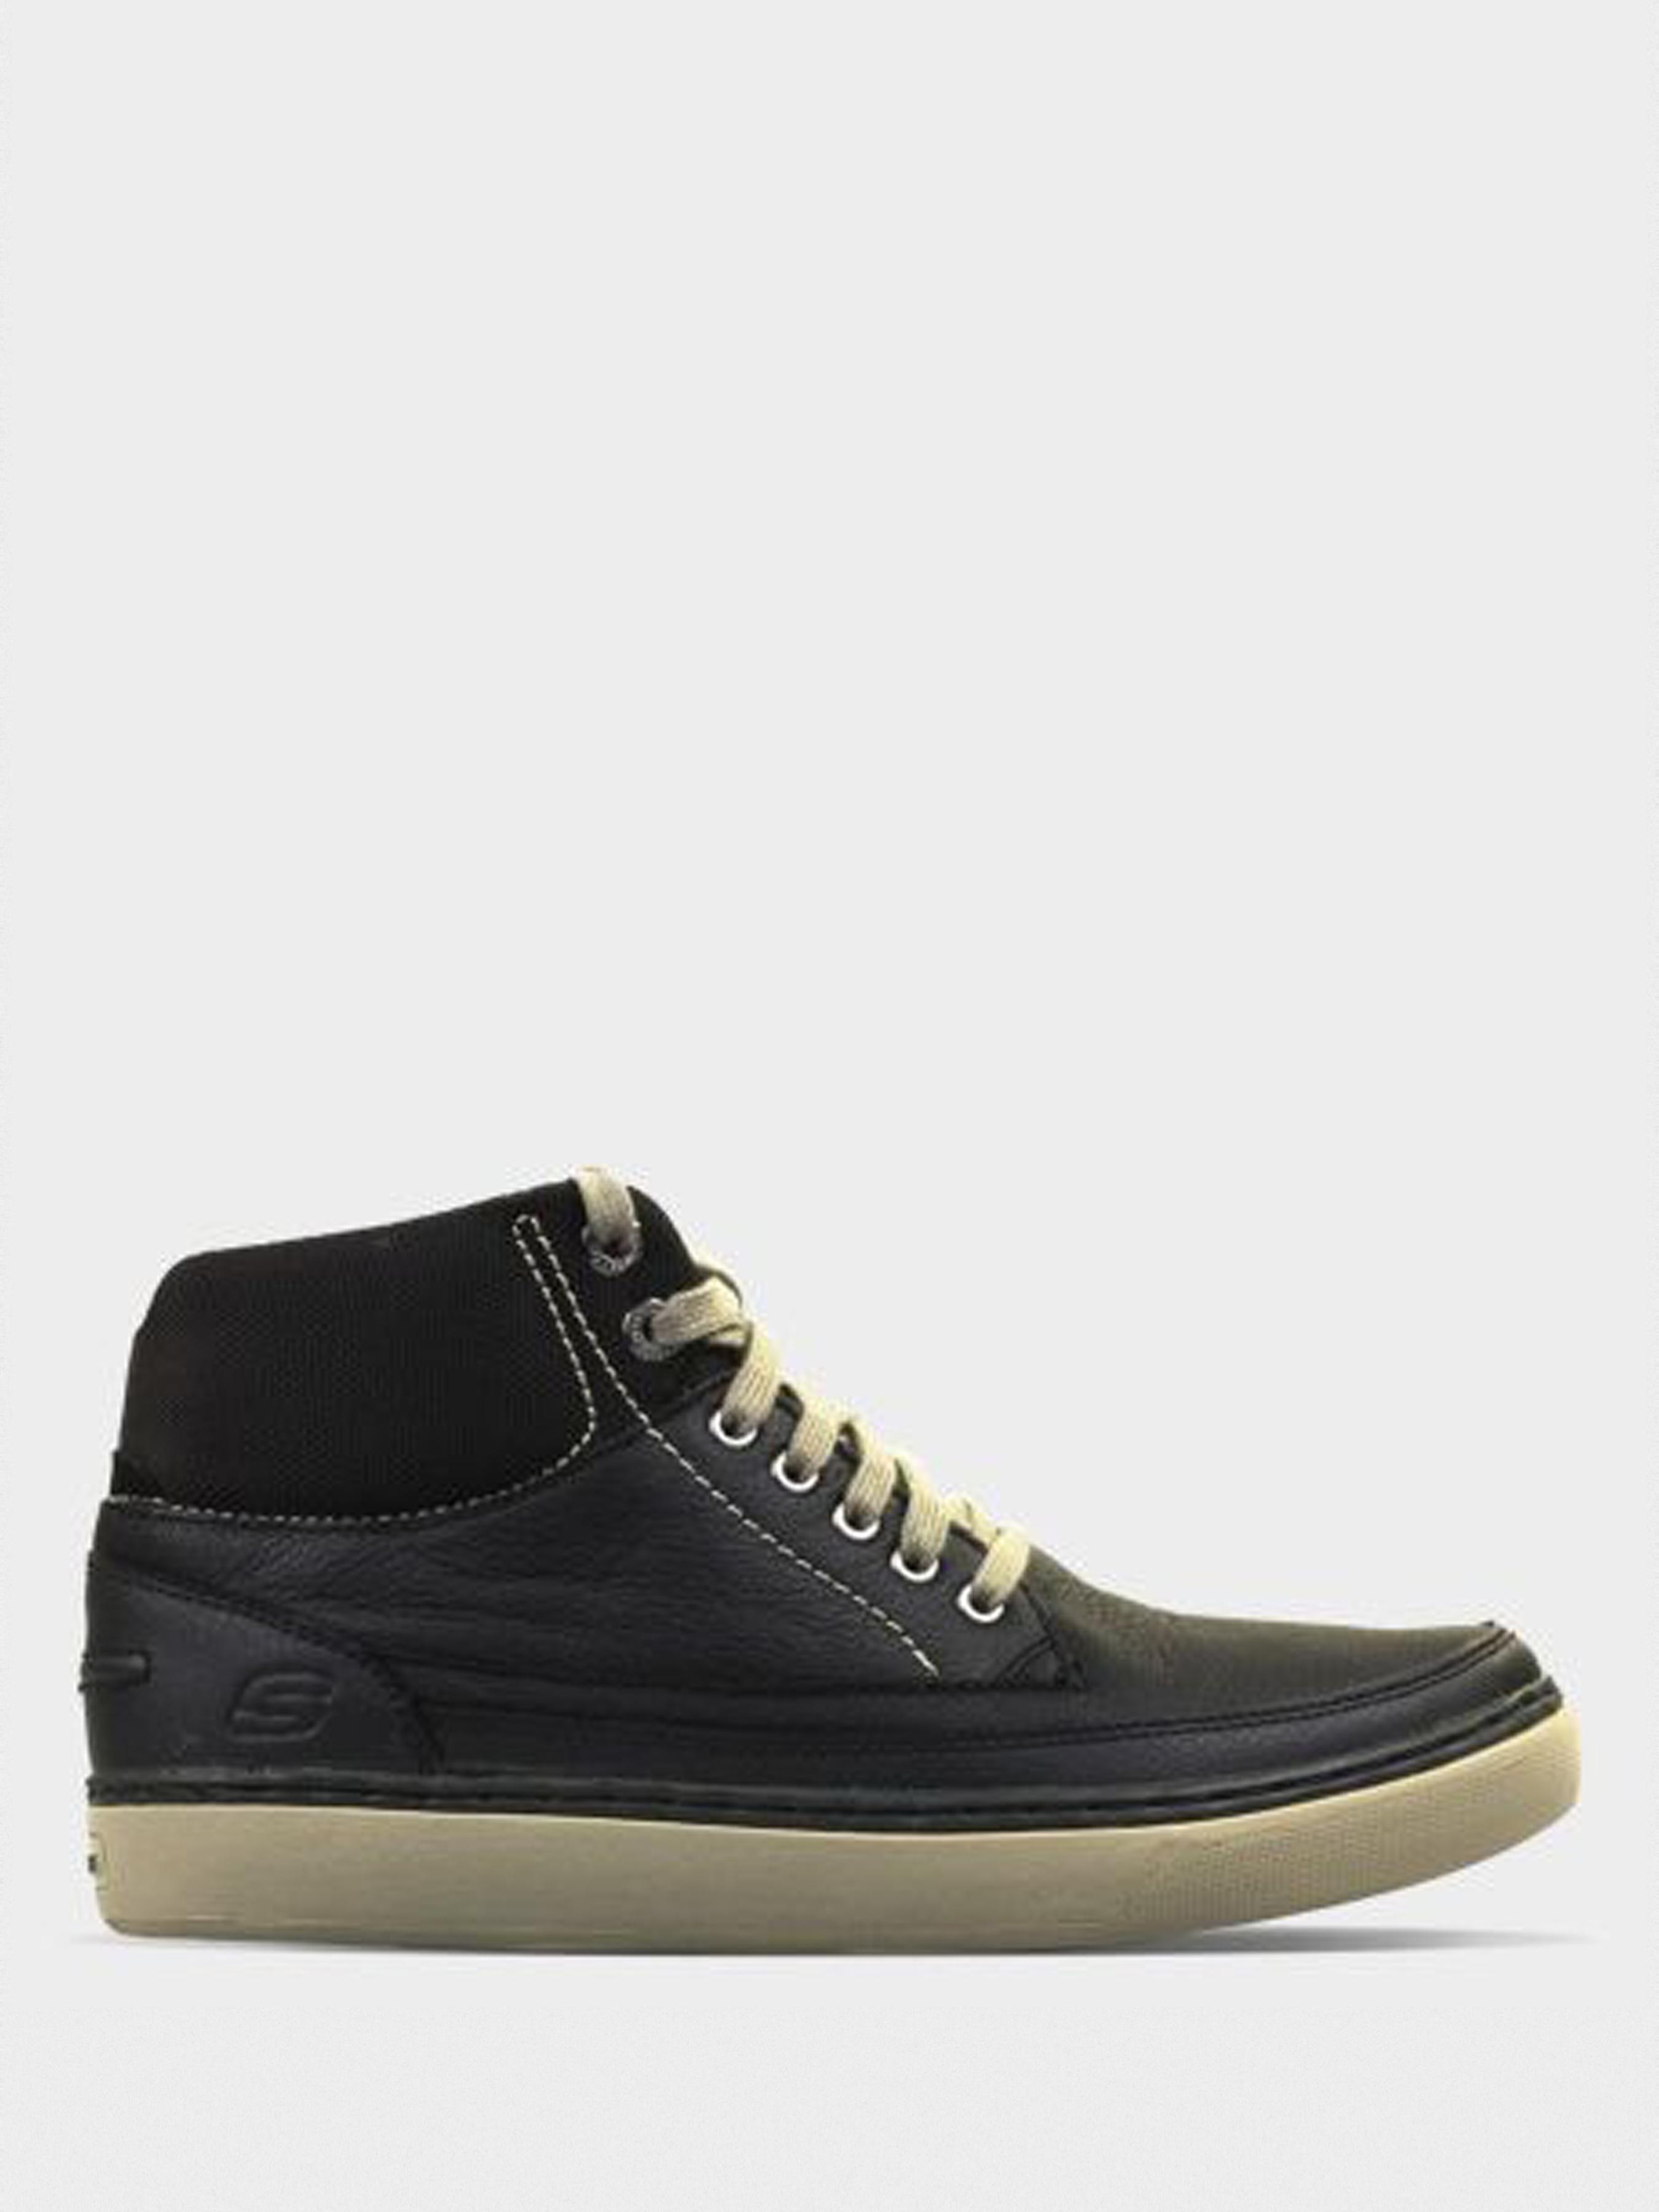 Ботинки для мужчин Skechers KM2759 , 2017